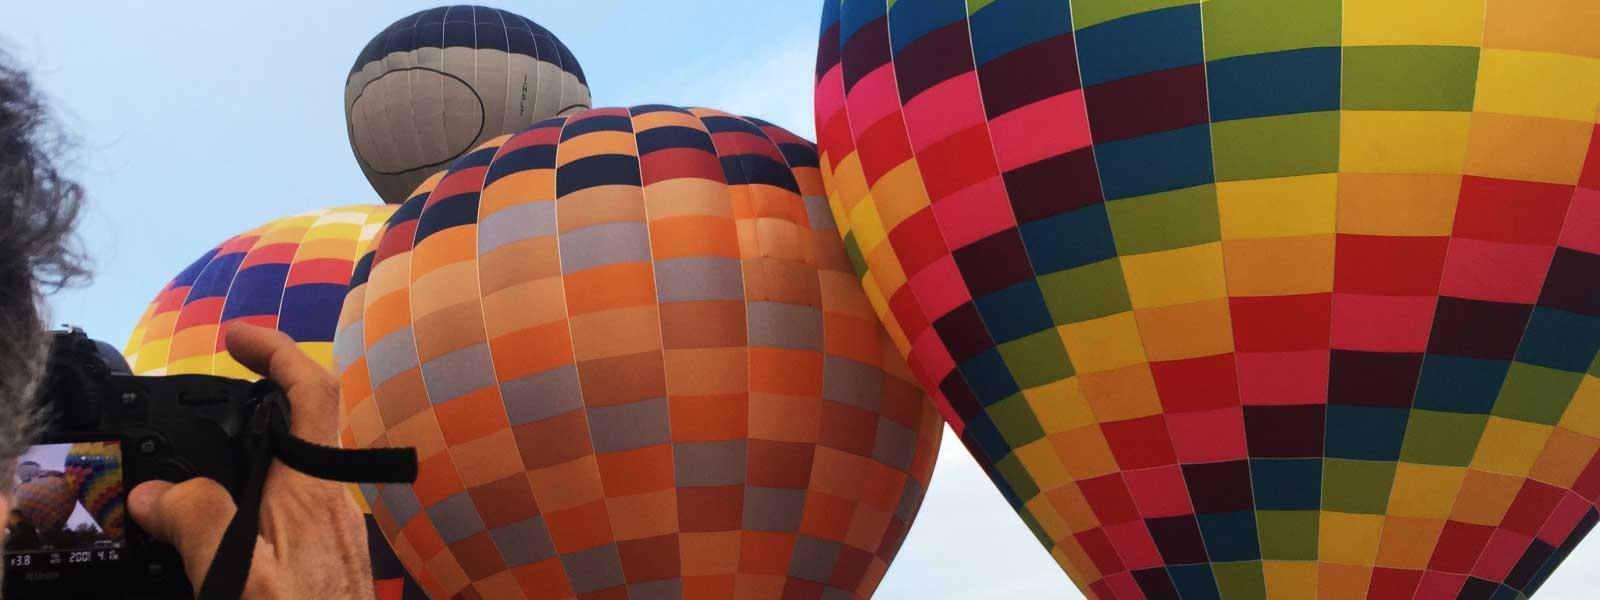 colourful-balloons-at-takeoff-tuscany-italy